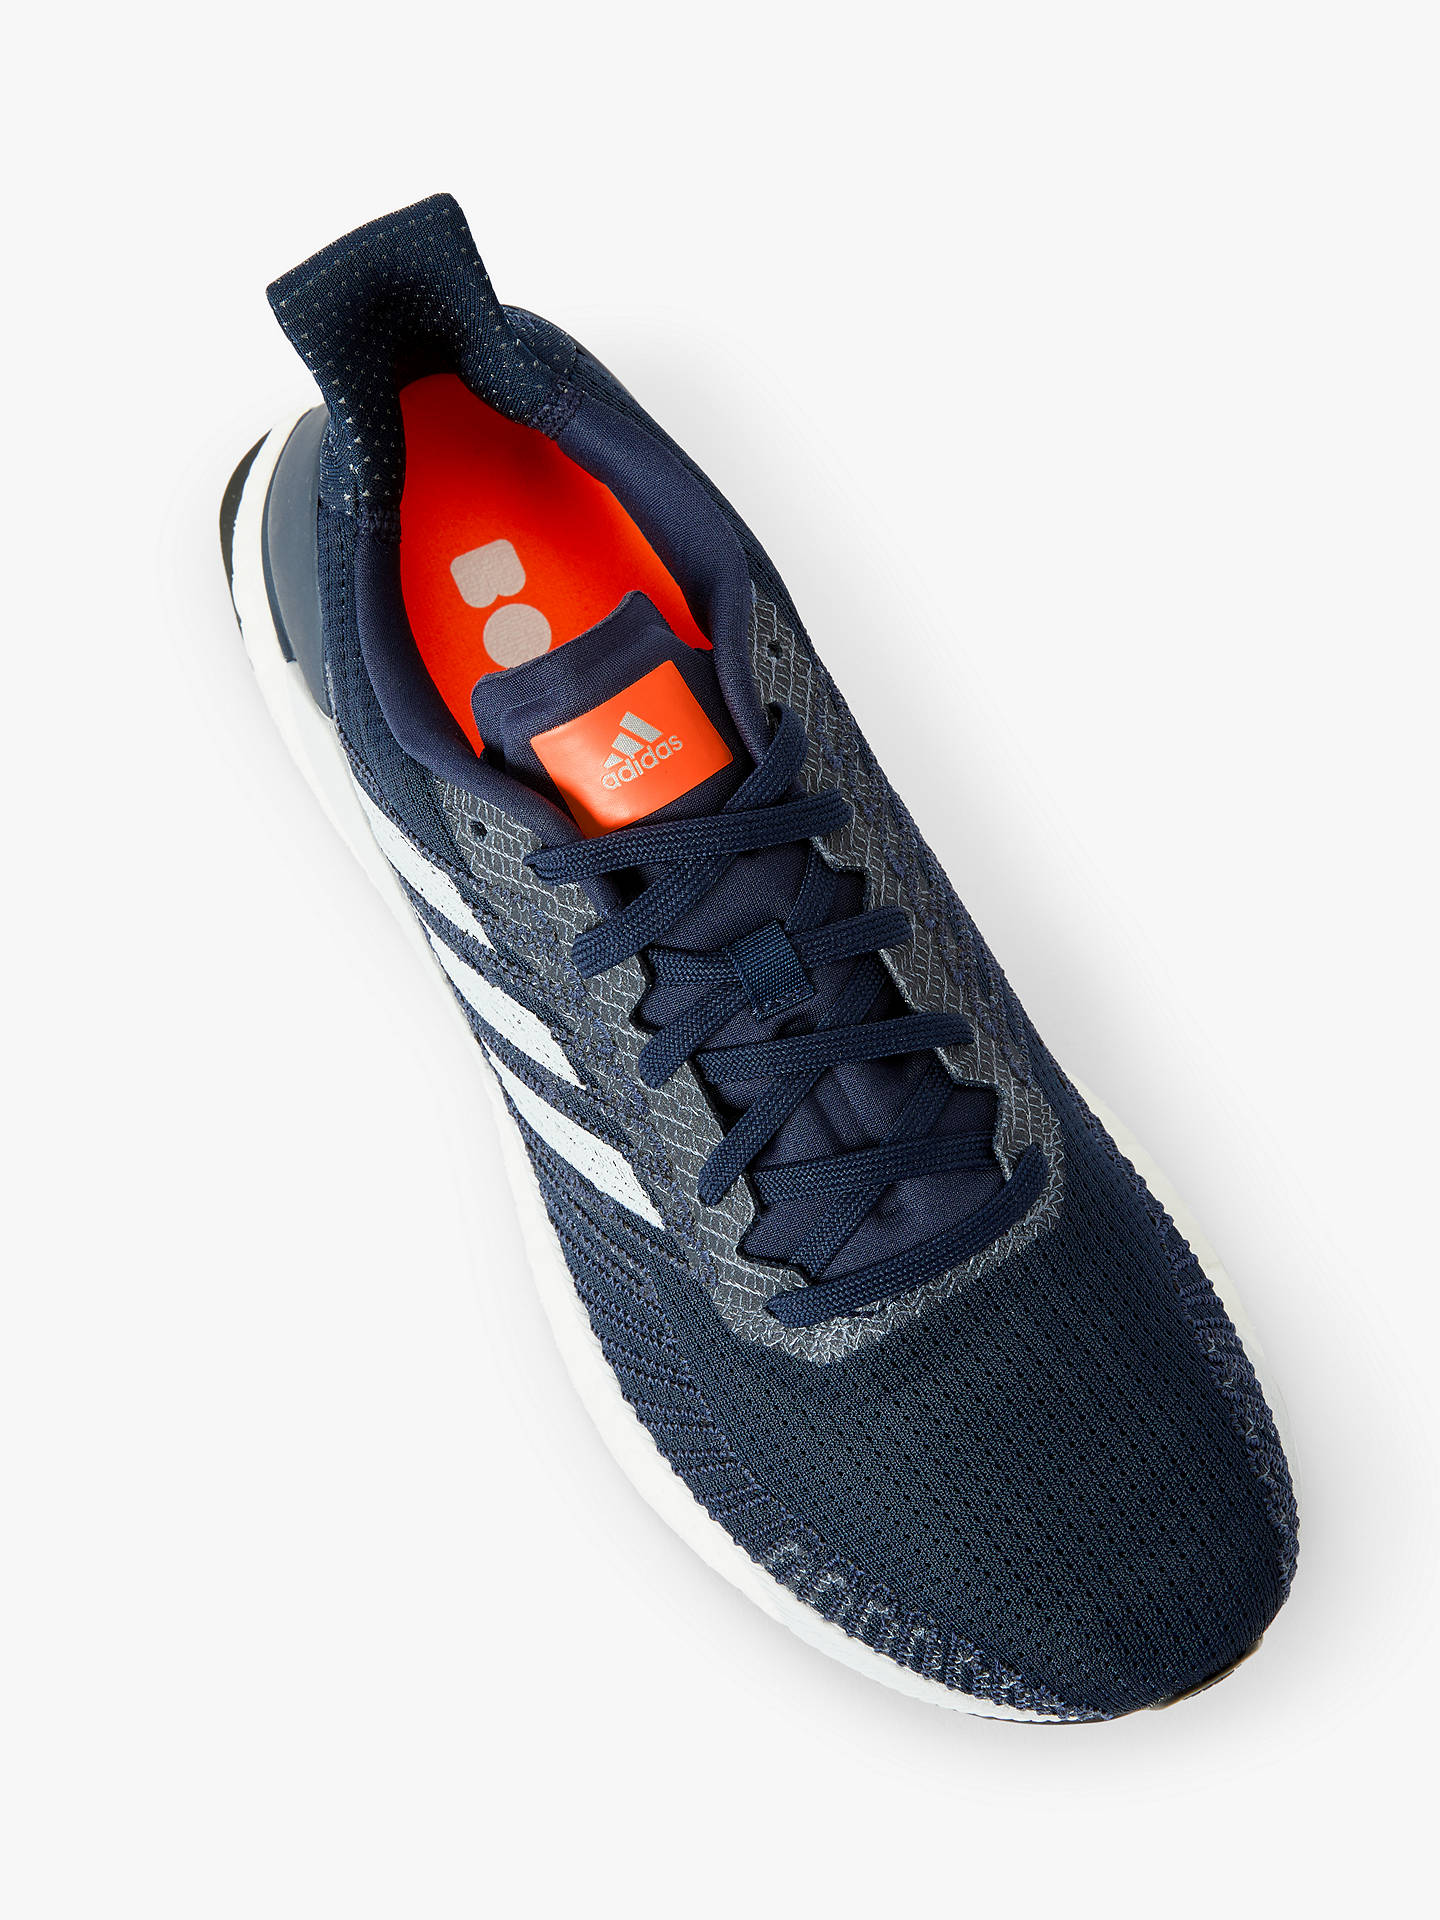 adidas Solar Boost 19 Men's Running Shoes at John Lewis